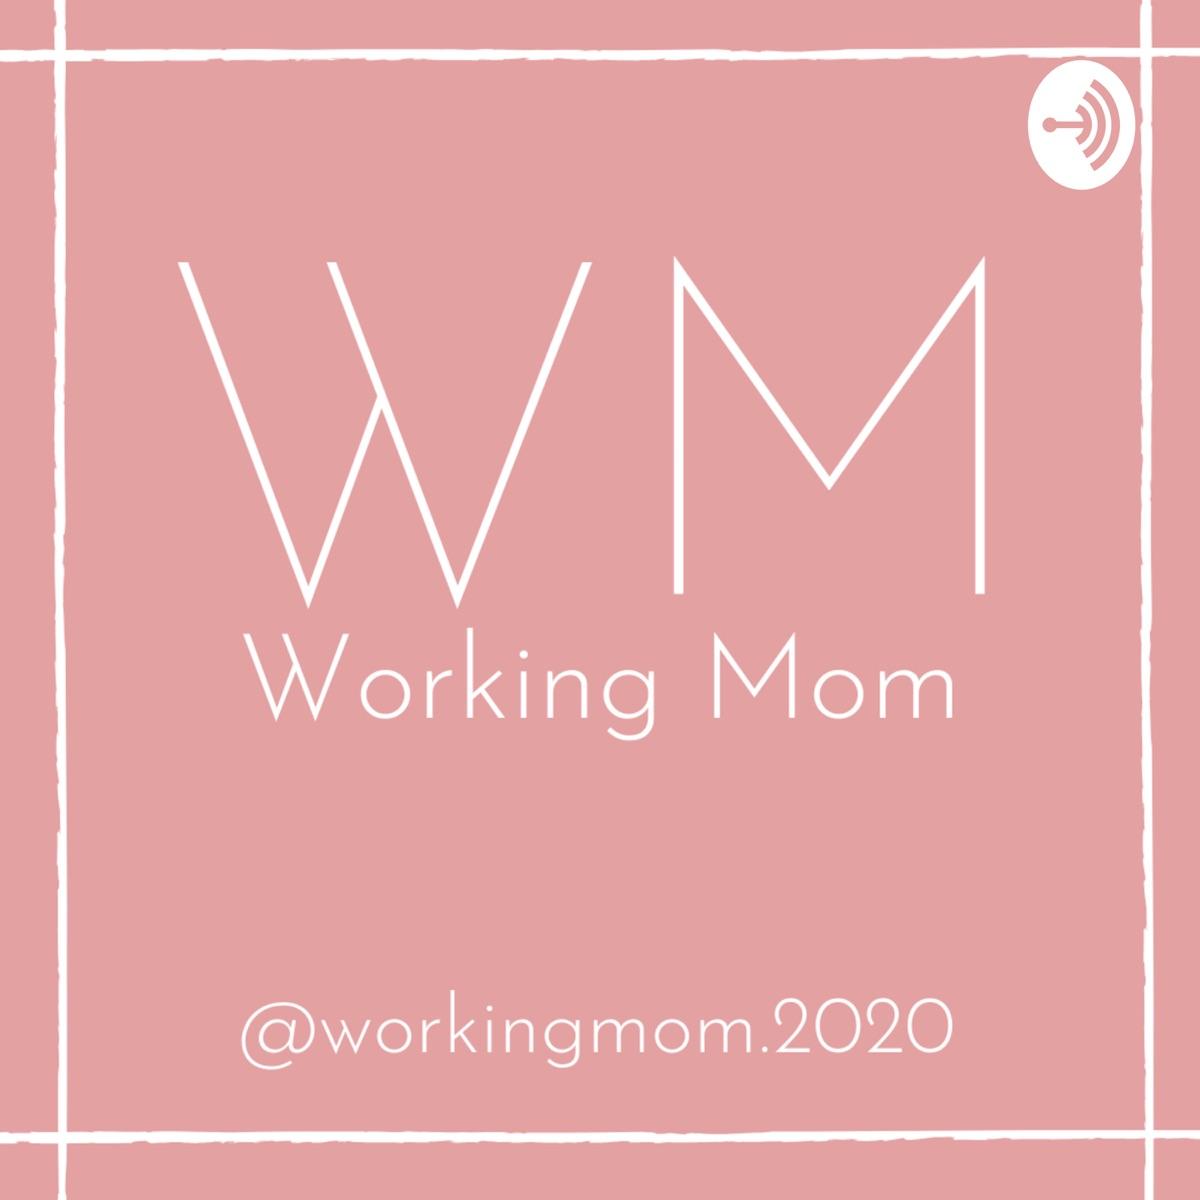 WORKING MOM 2020